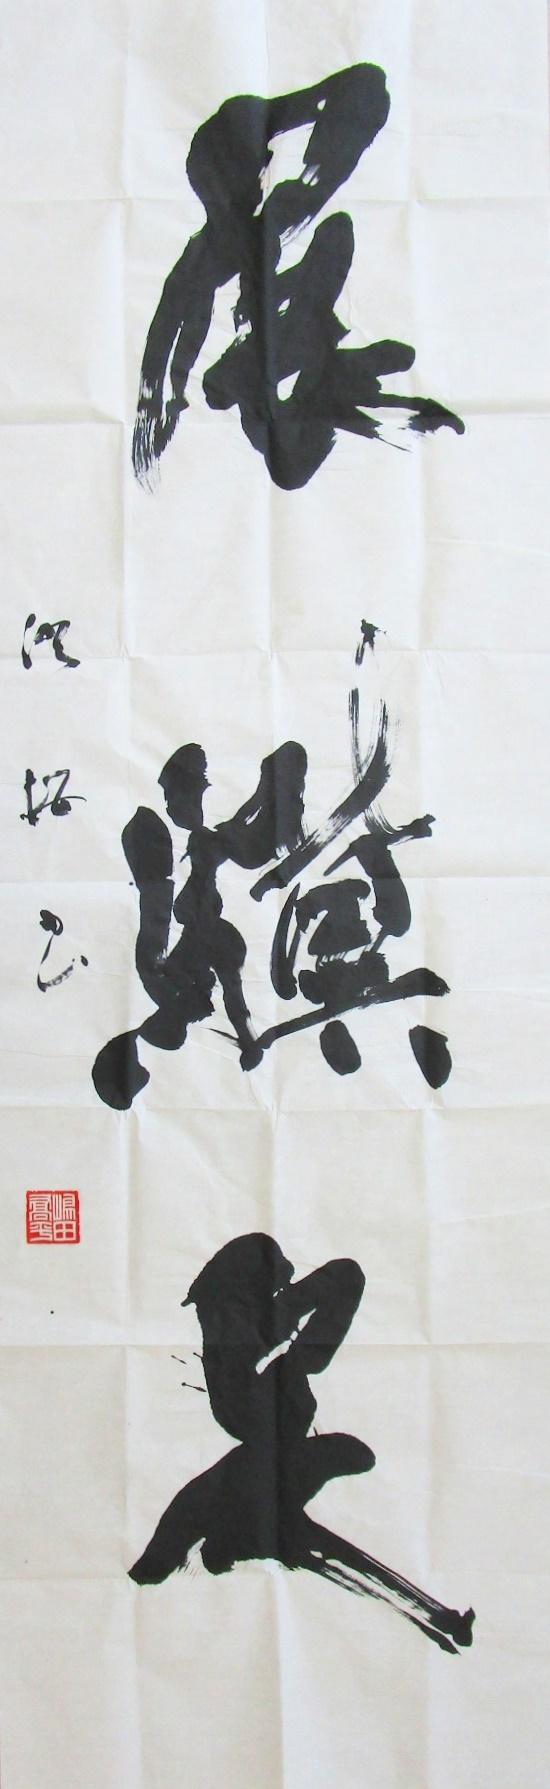 k-1-d-1.jpg